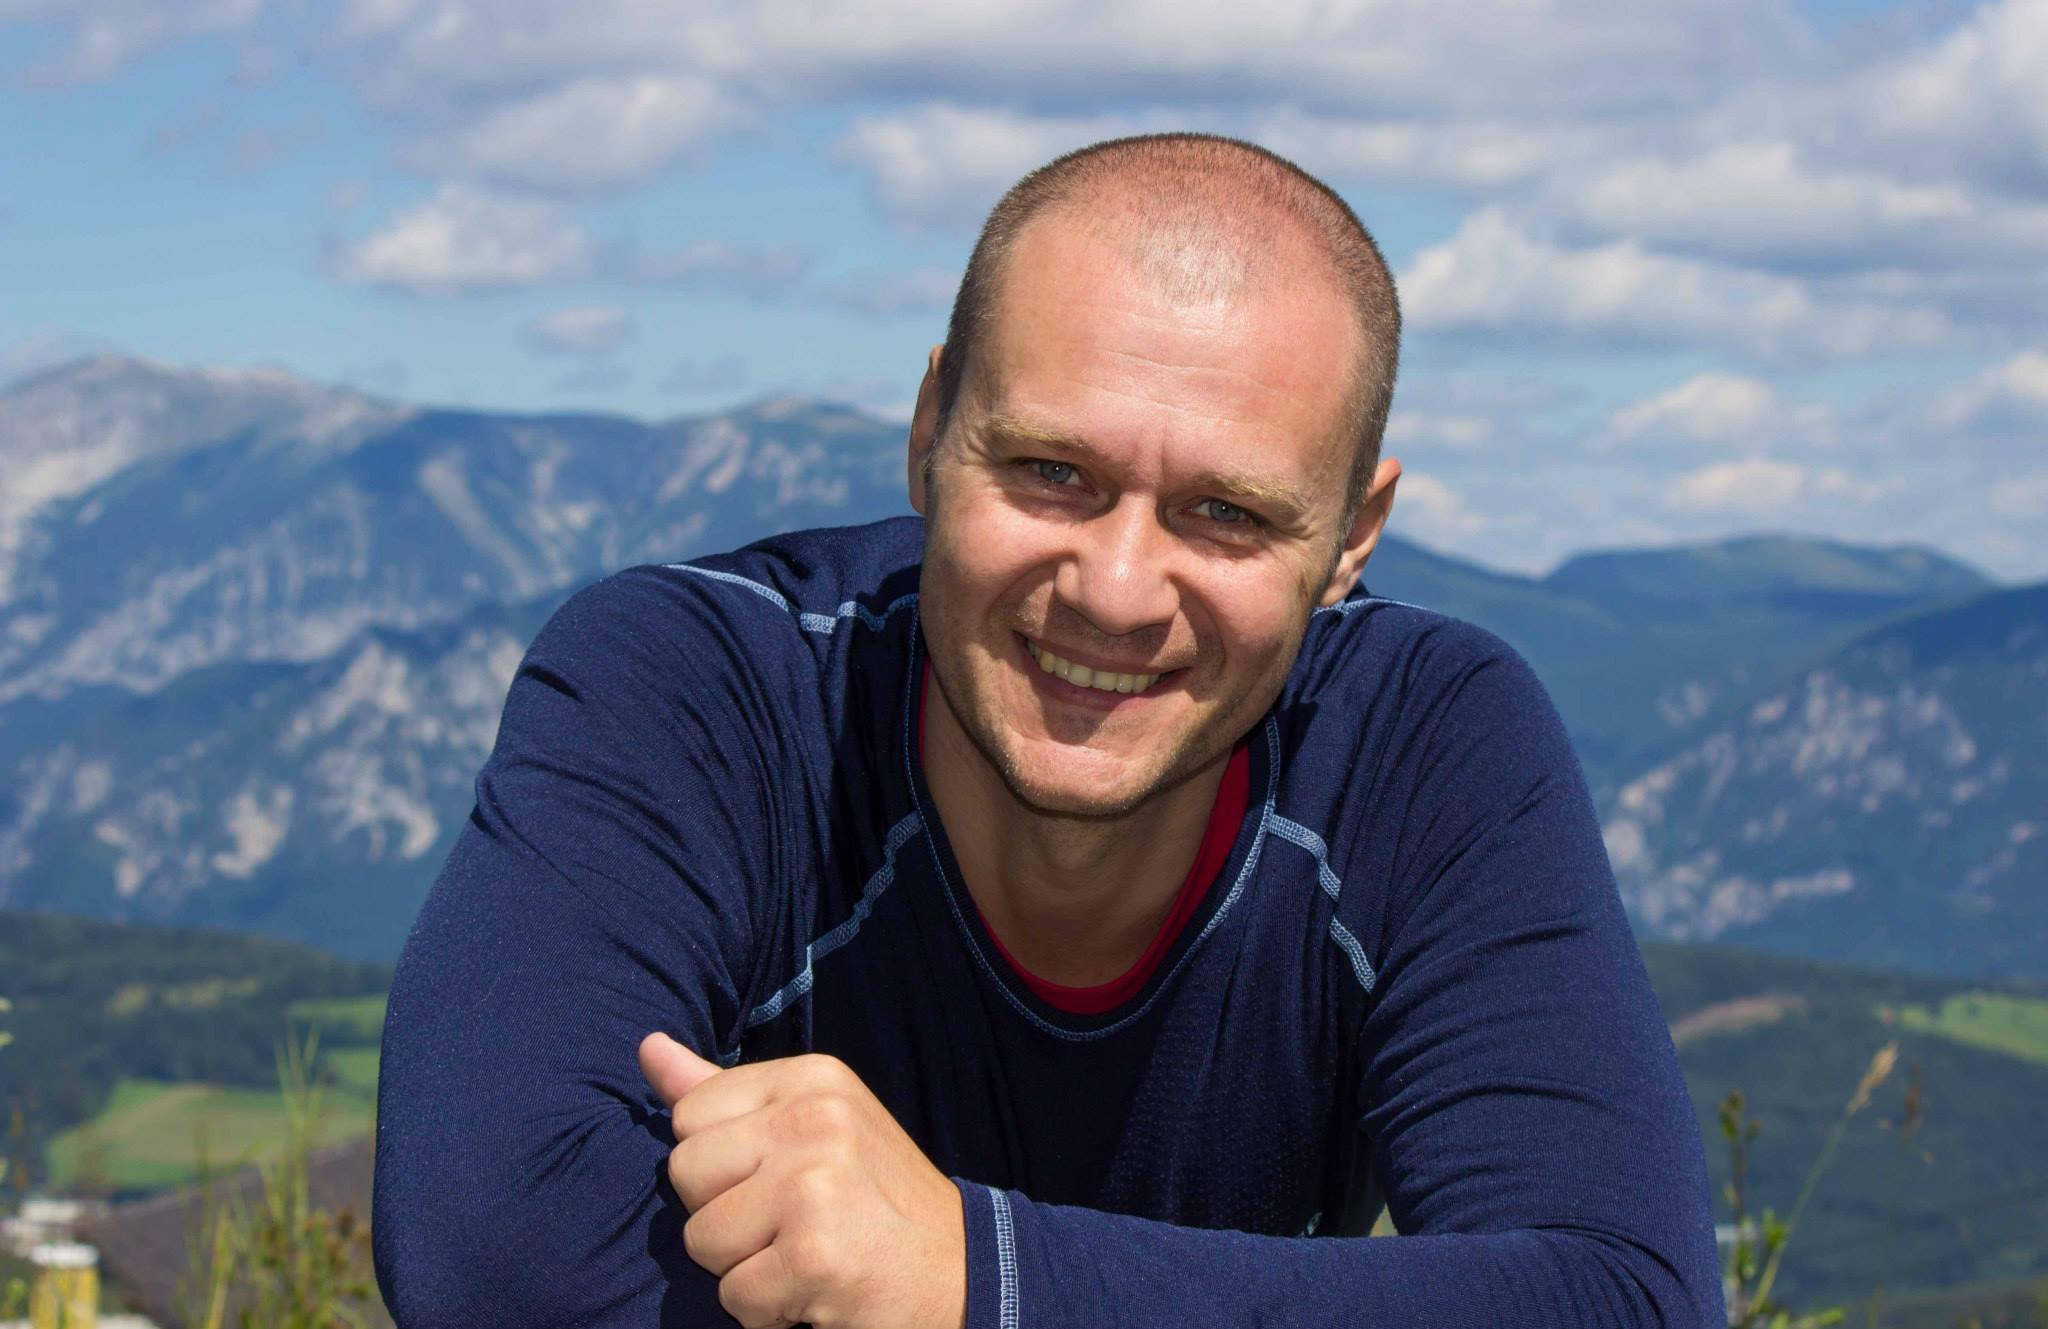 miroslav-macejko-specialista-na-funkcny-chrbat